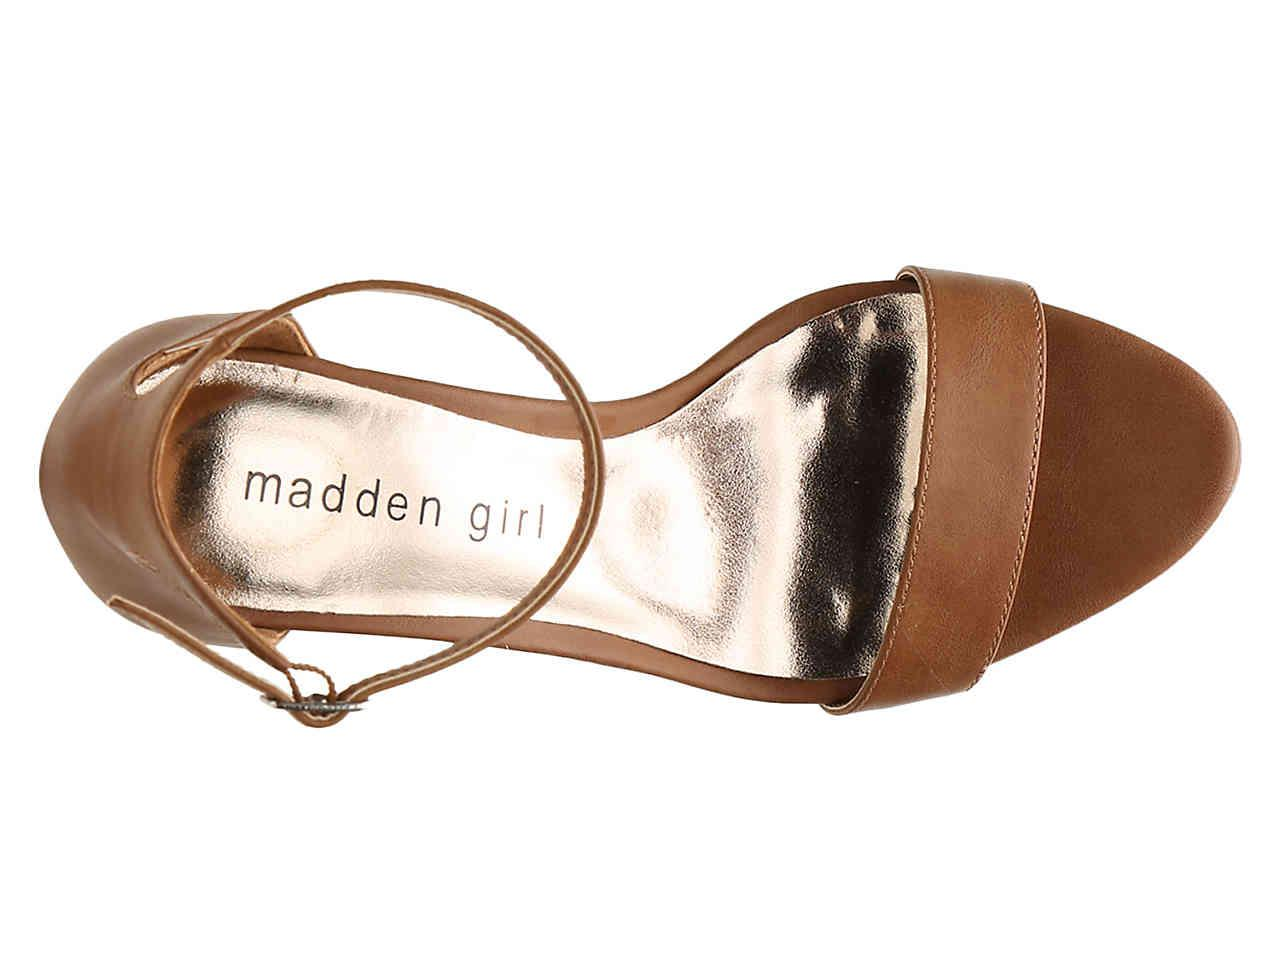 Madden Girl Bella Sandal in Brown - Lyst